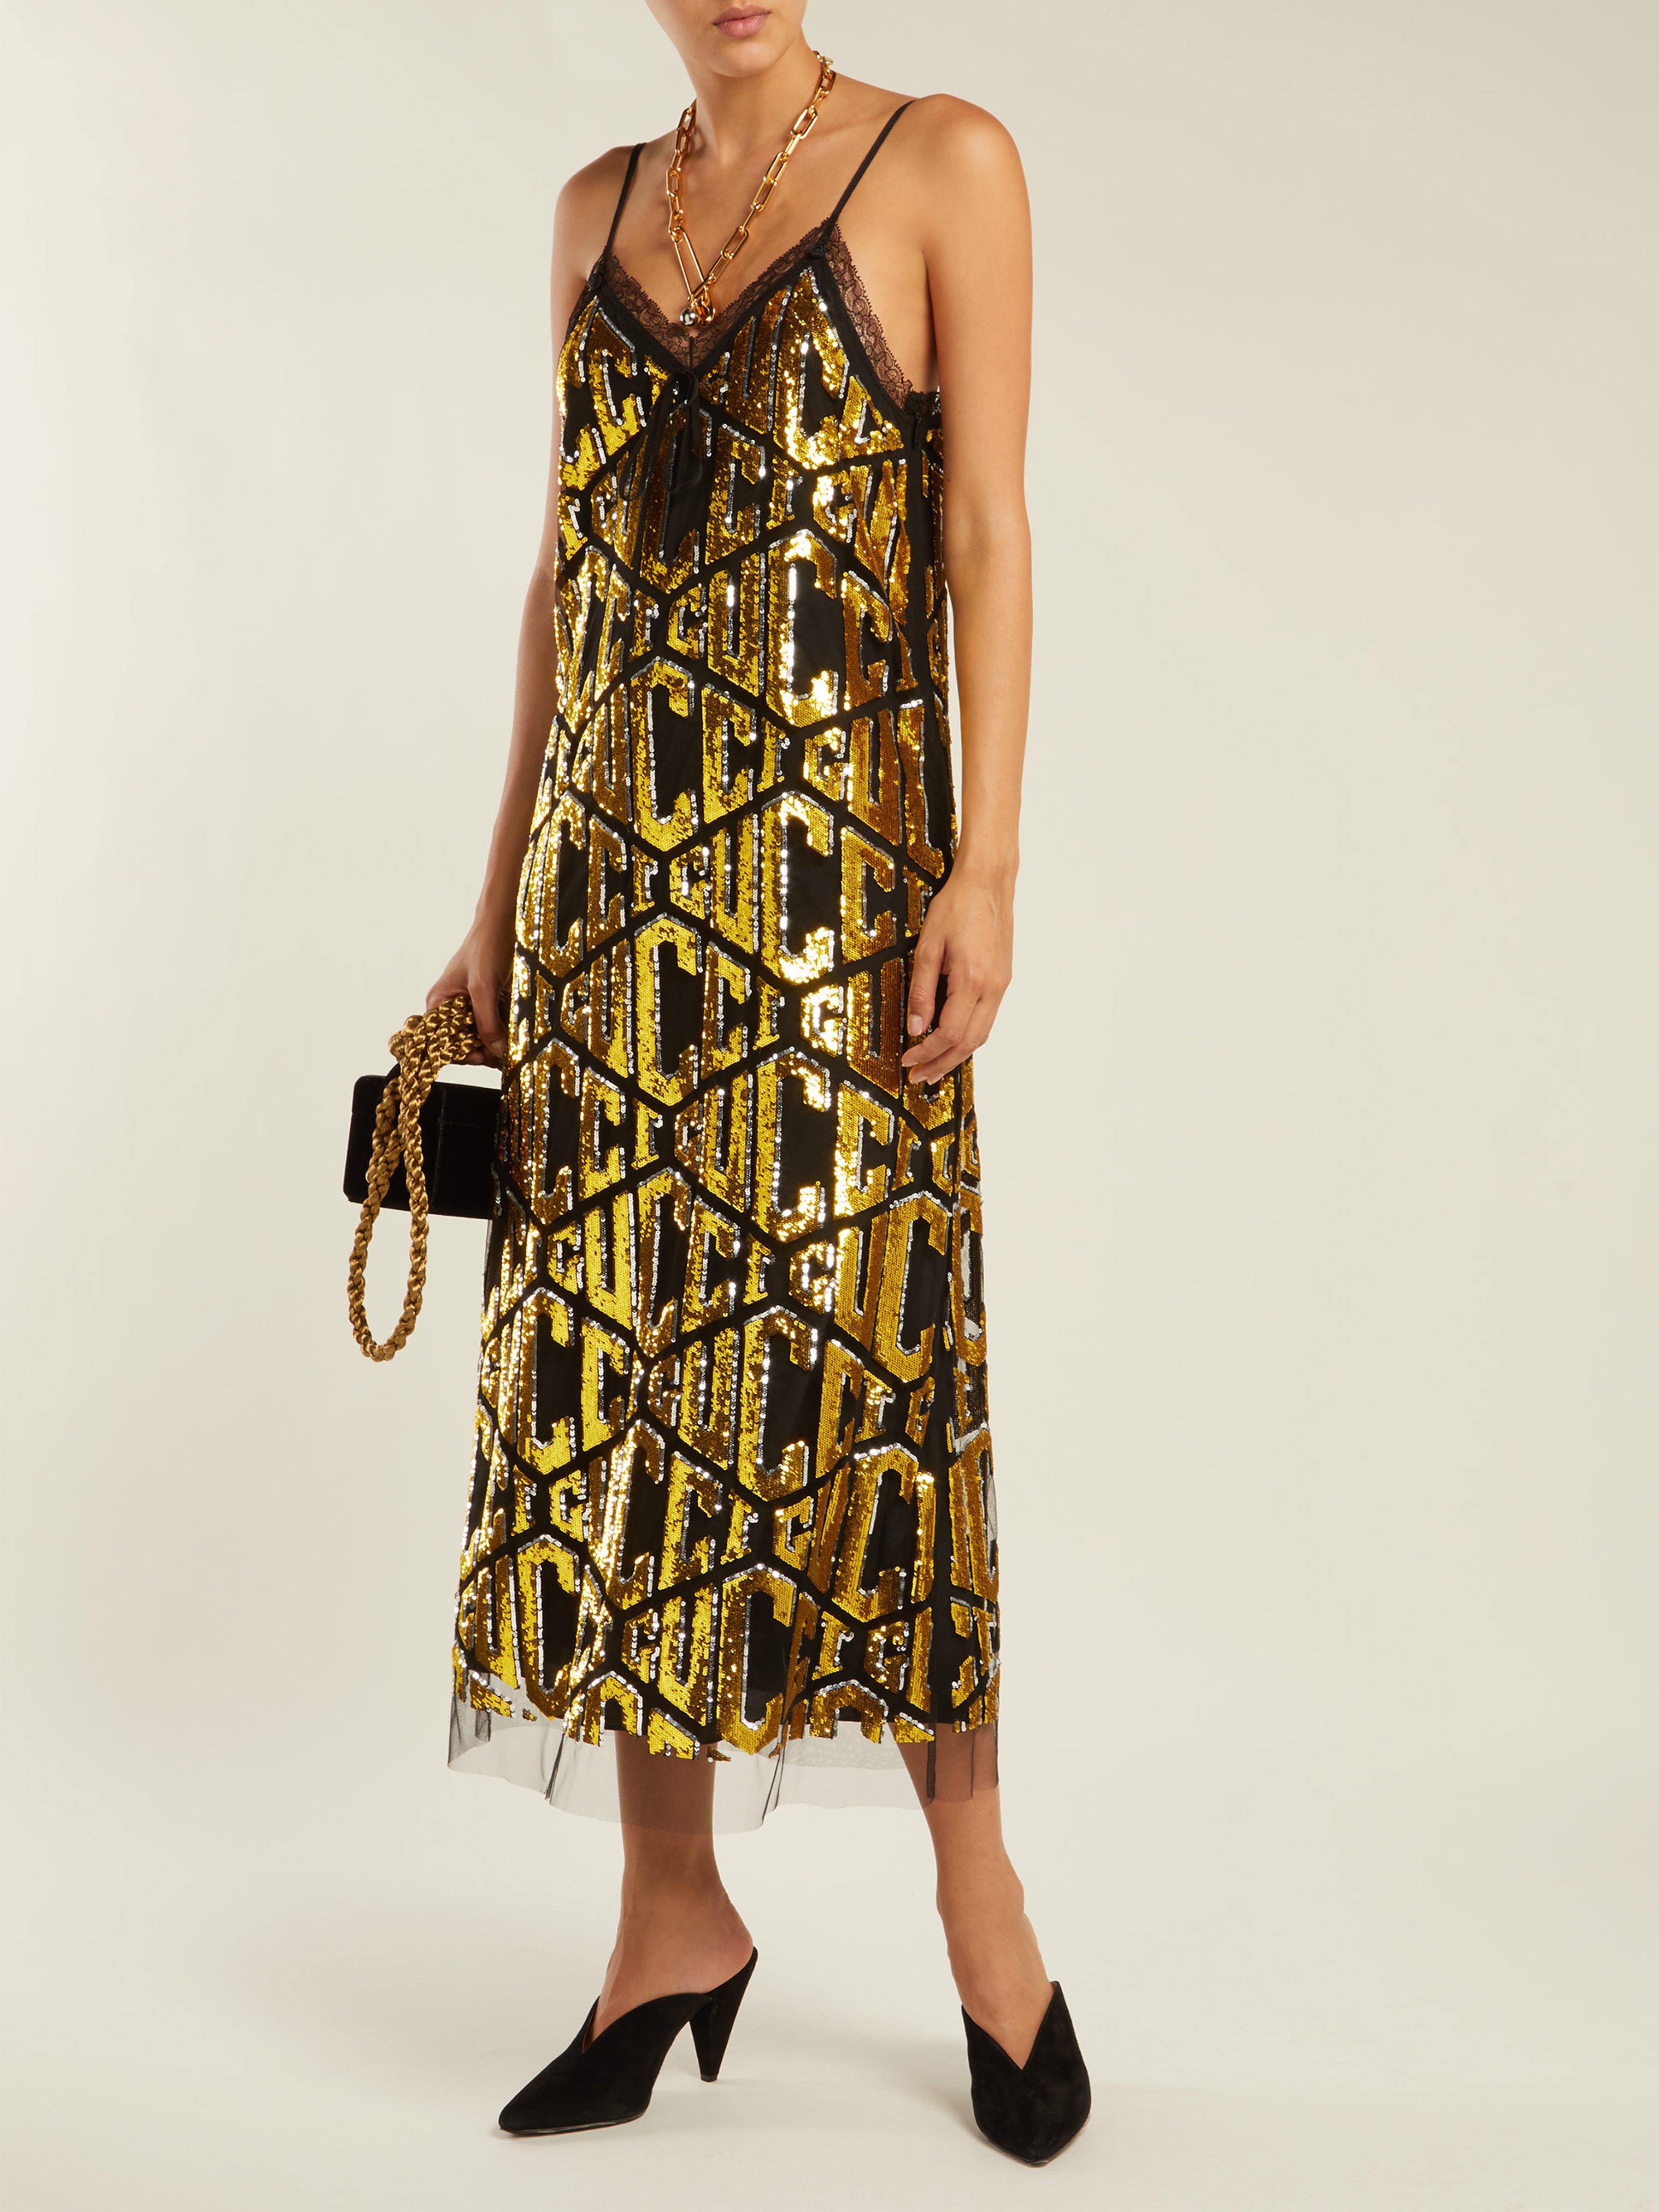 cff69e4b599b7 Gucci Sequin Embellished Logo Dress in Black - Lyst